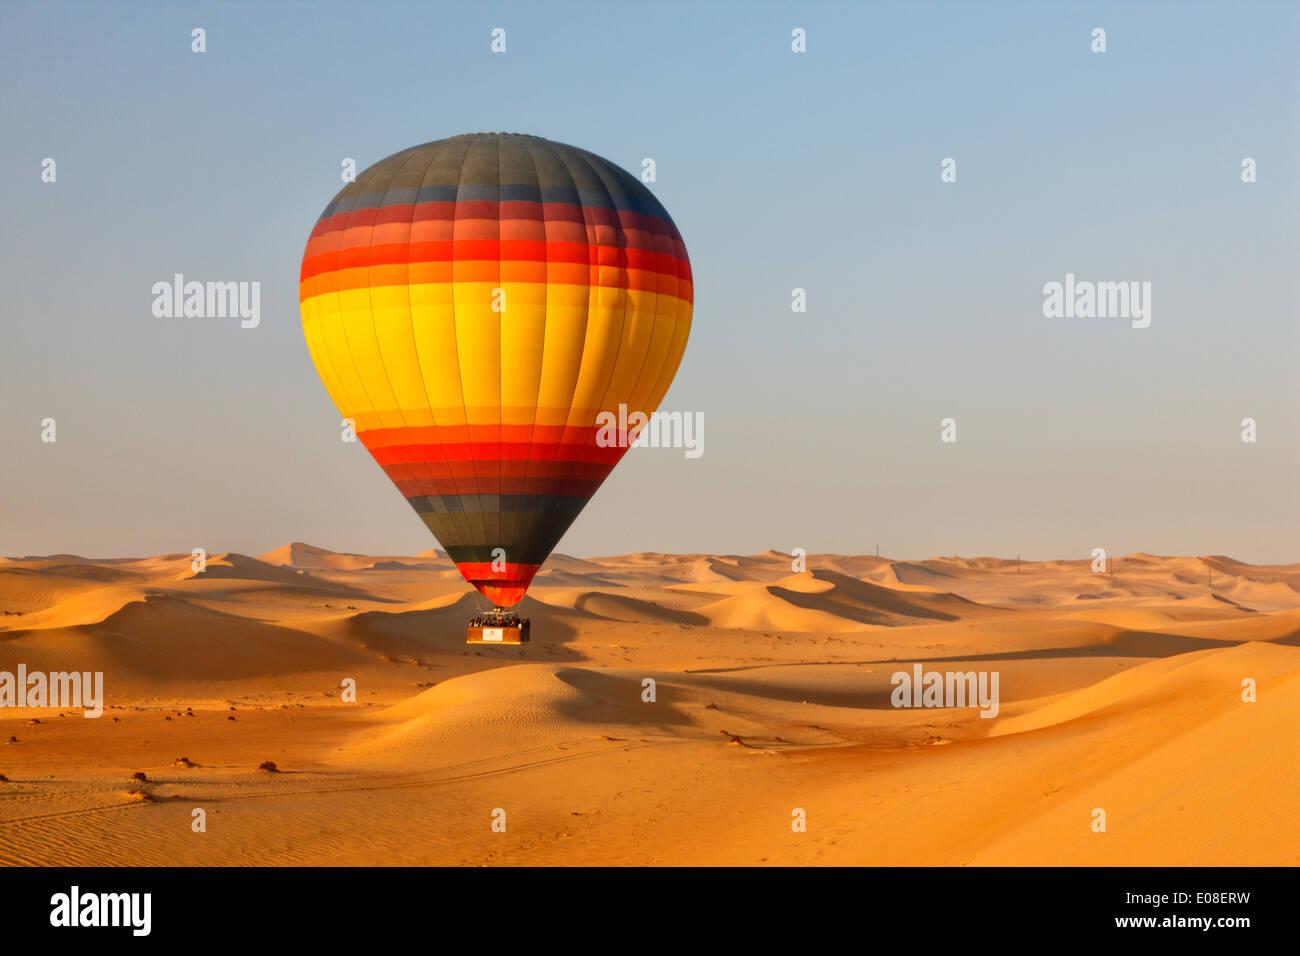 Fly over Dubai desert with hot air balloon - Stock Image